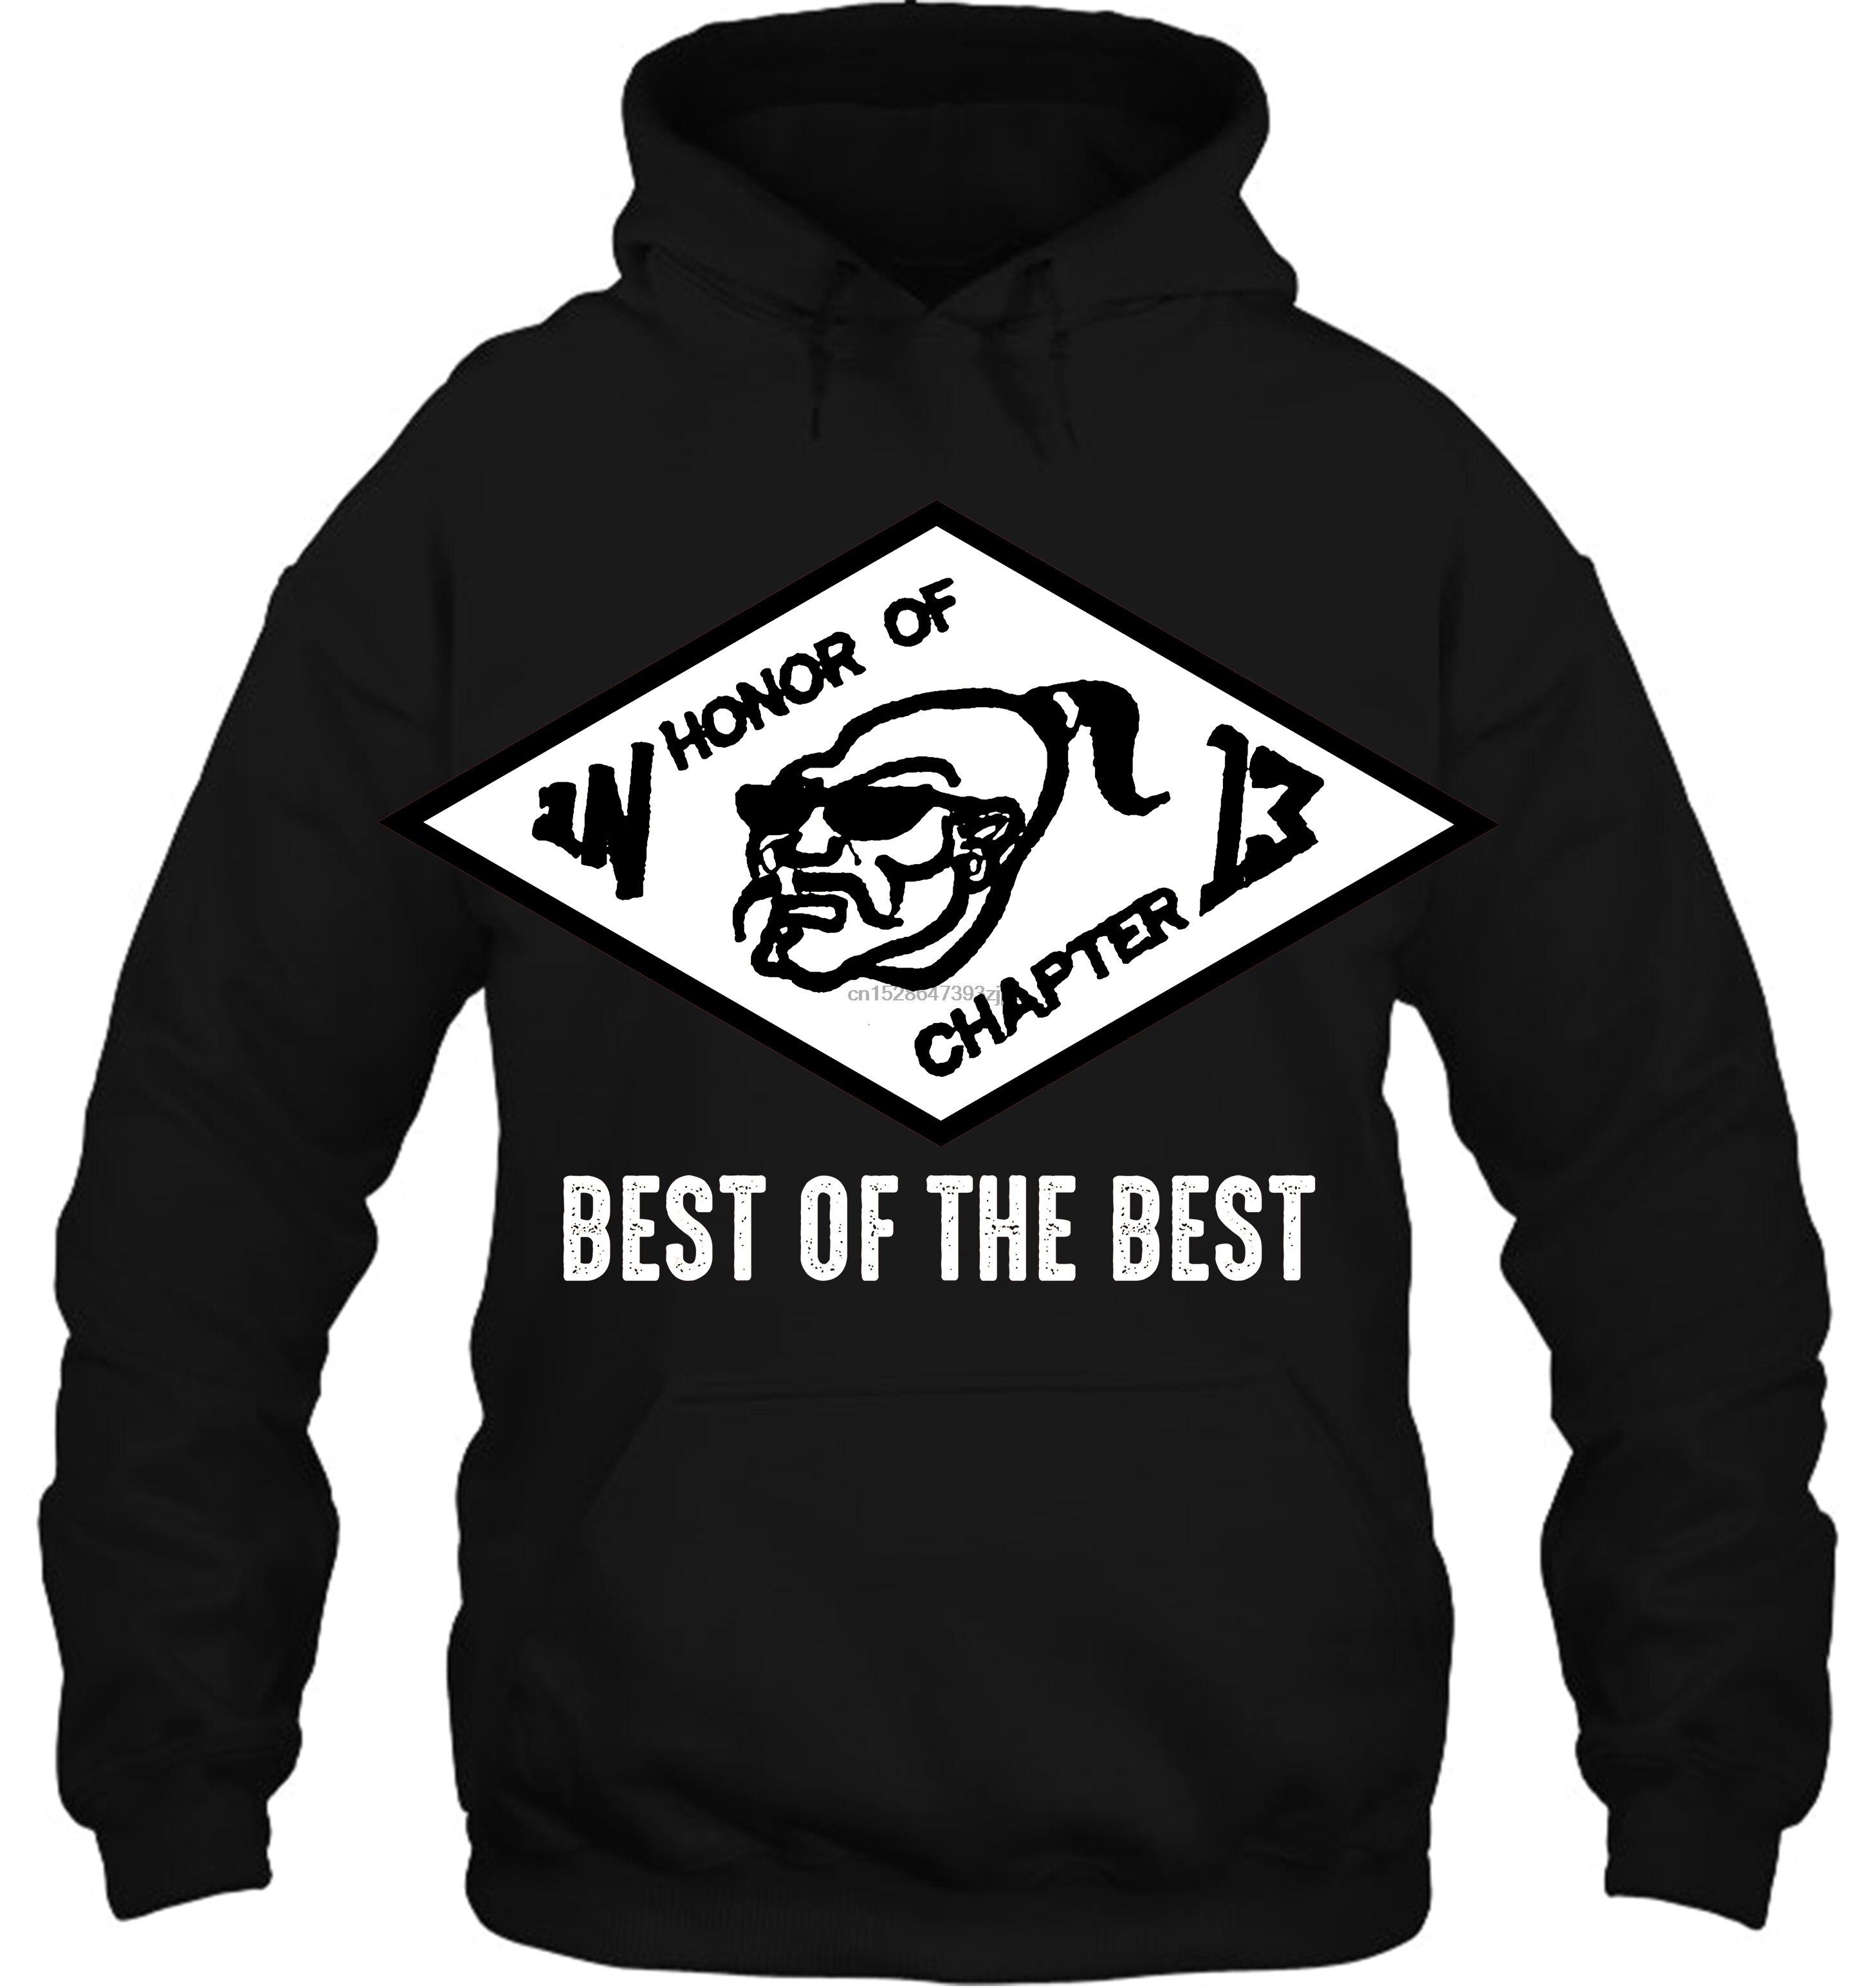 Mongols MC For Man Casual Tops Gangster Man (SizeS 6XL) Streetwear Men Women Hoodies Sweatshirts